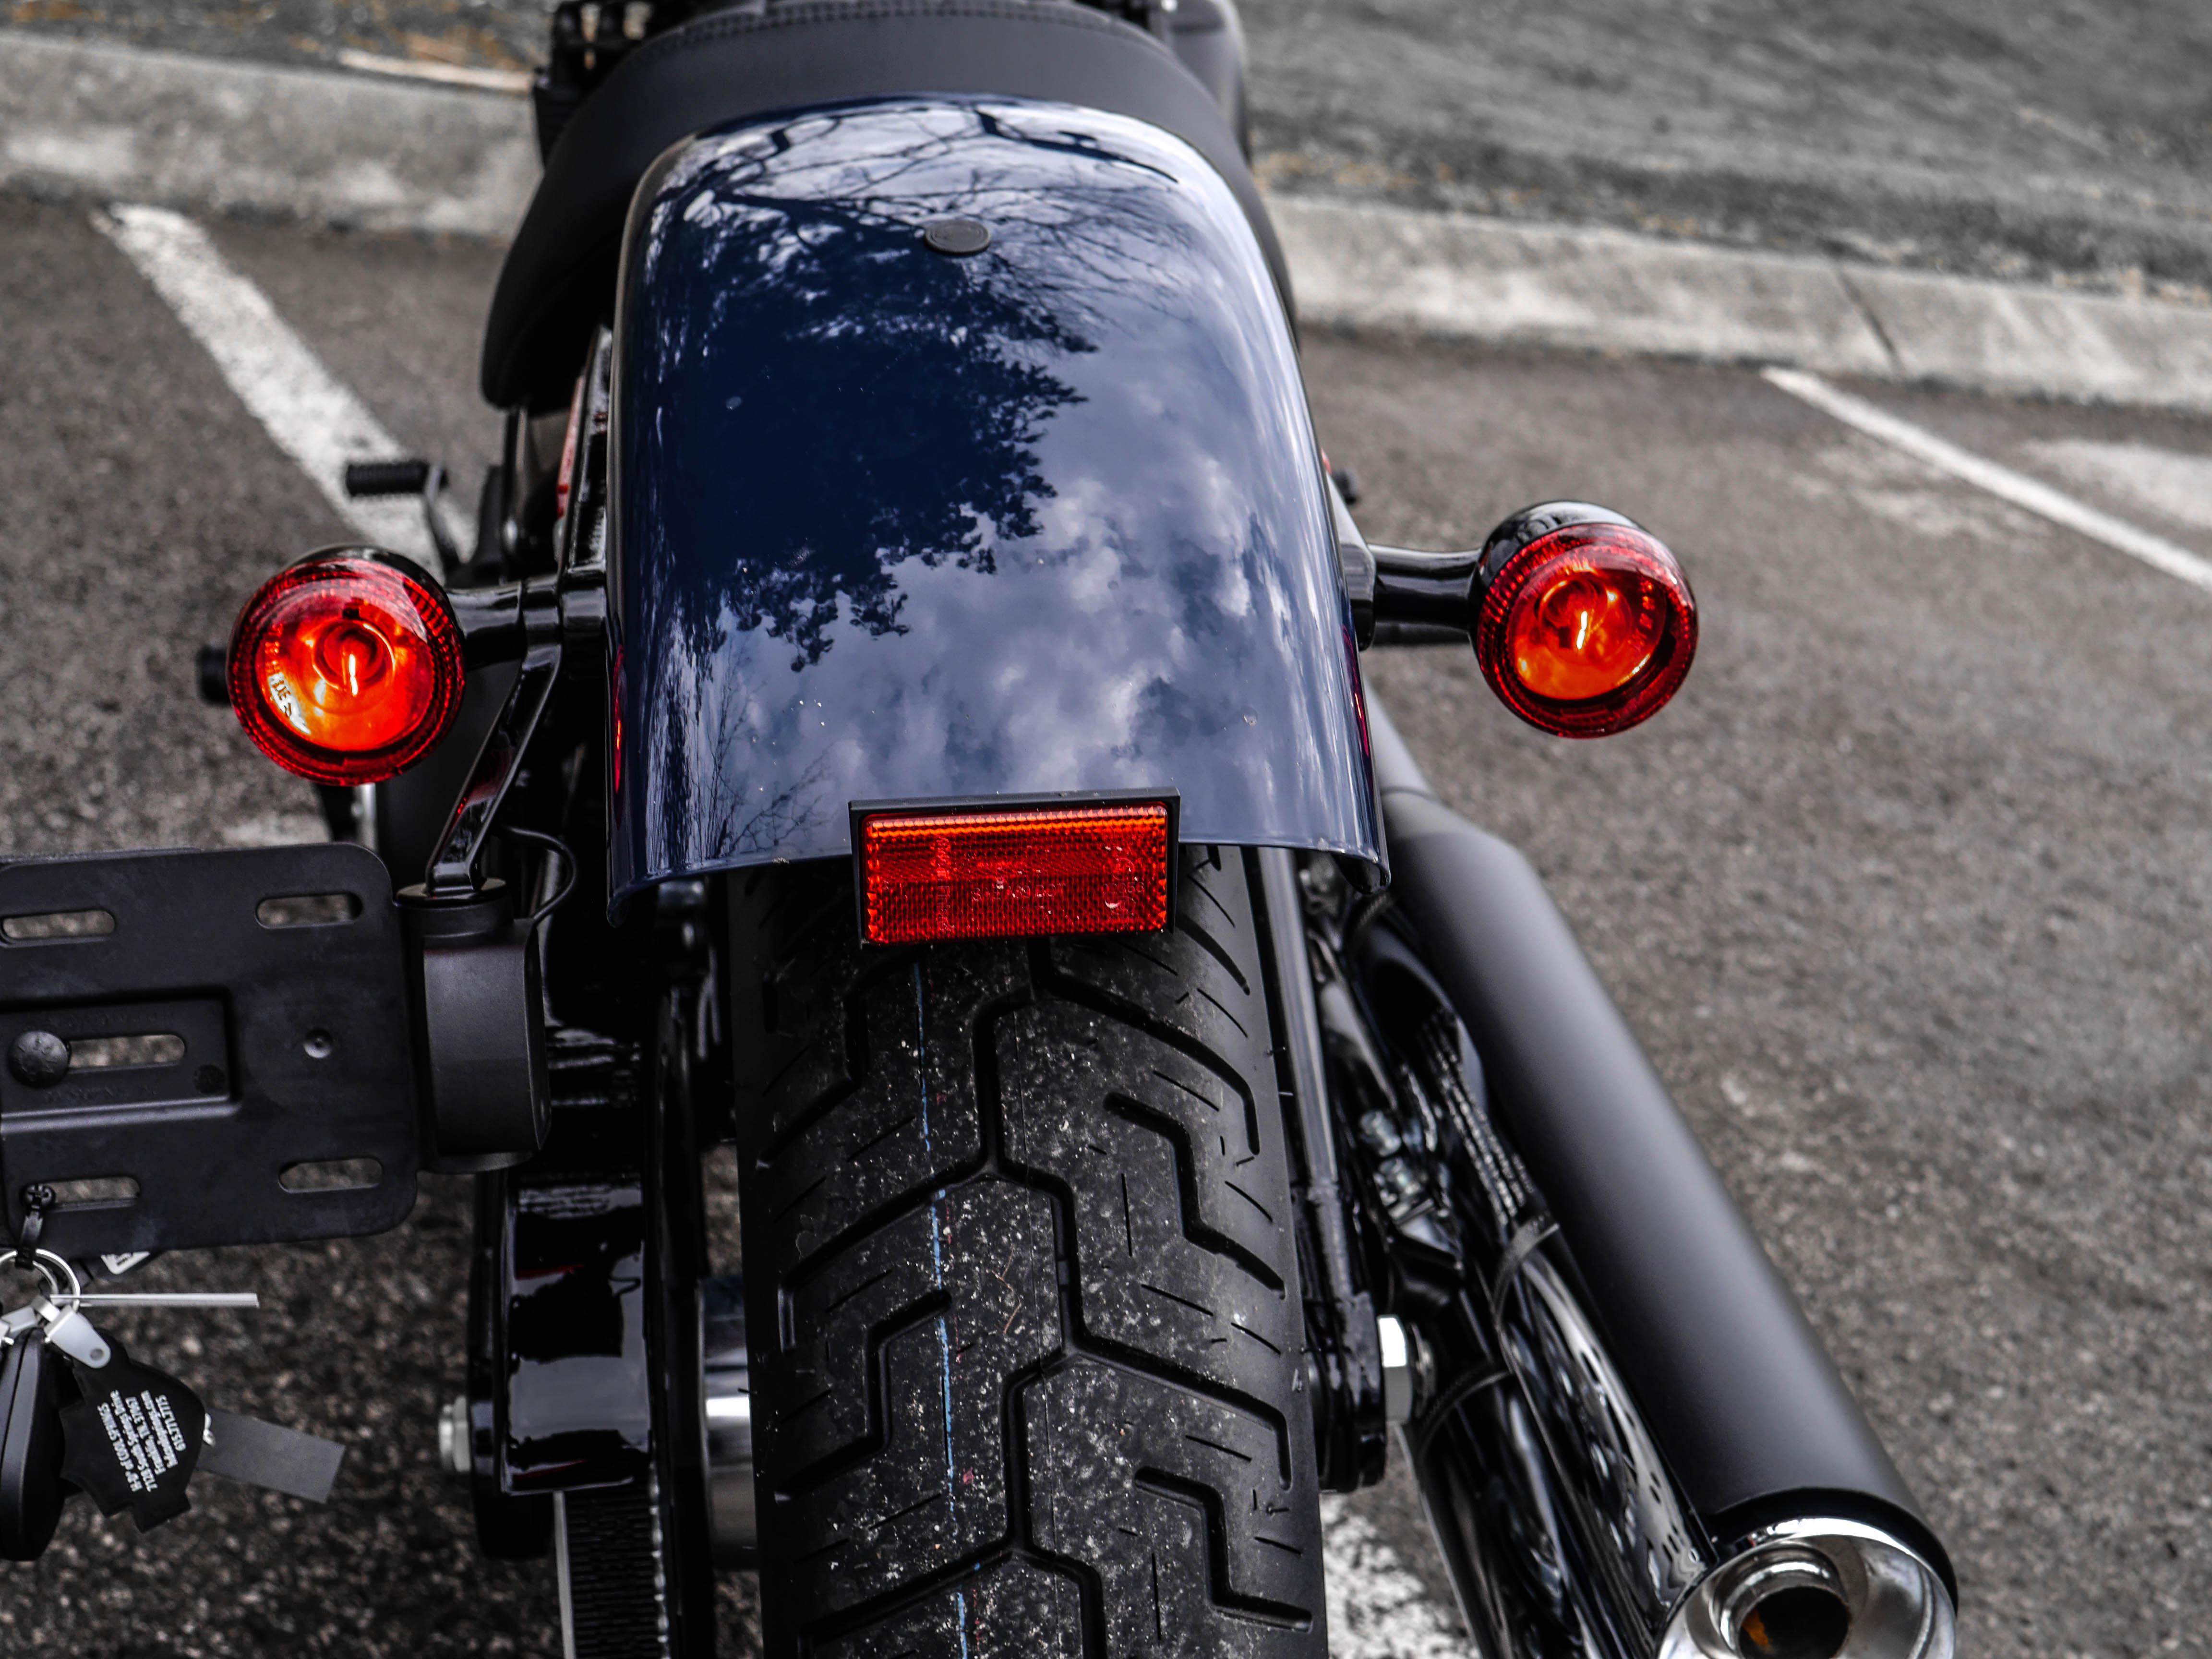 New 2019 Harley-Davidson Softail Street Bob